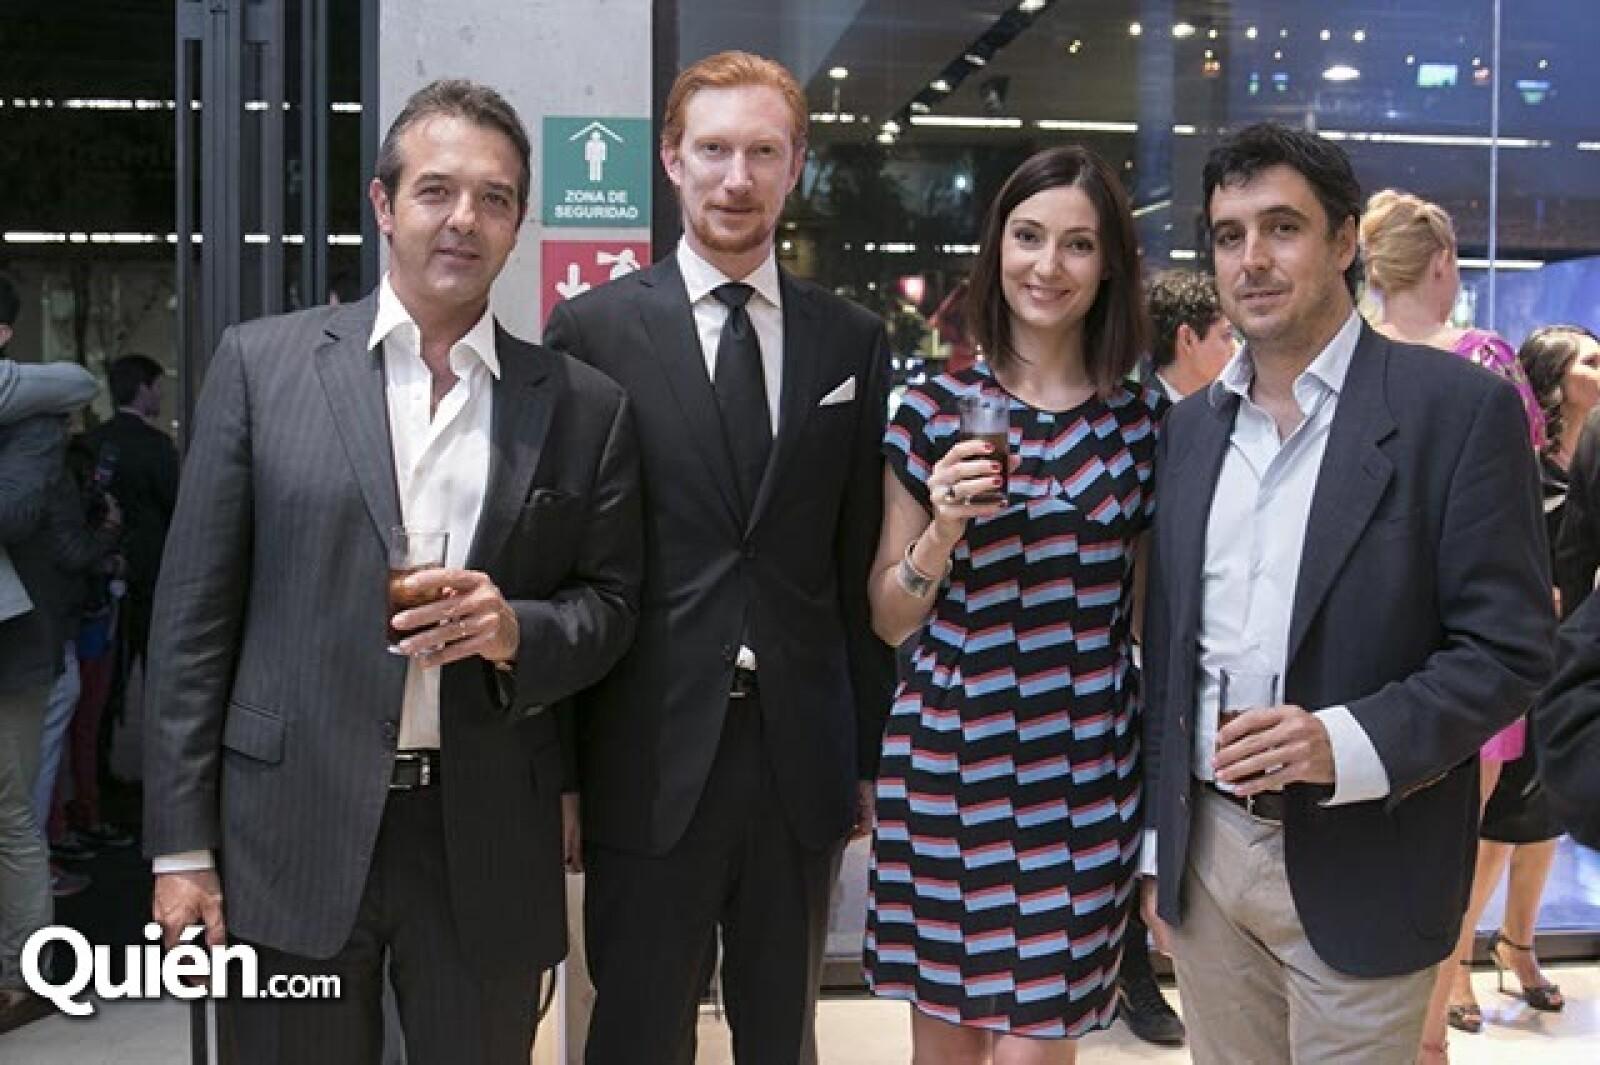 Poli Luca,Federcio Pasquetto,Francesca Blasone y Javier Brandoli